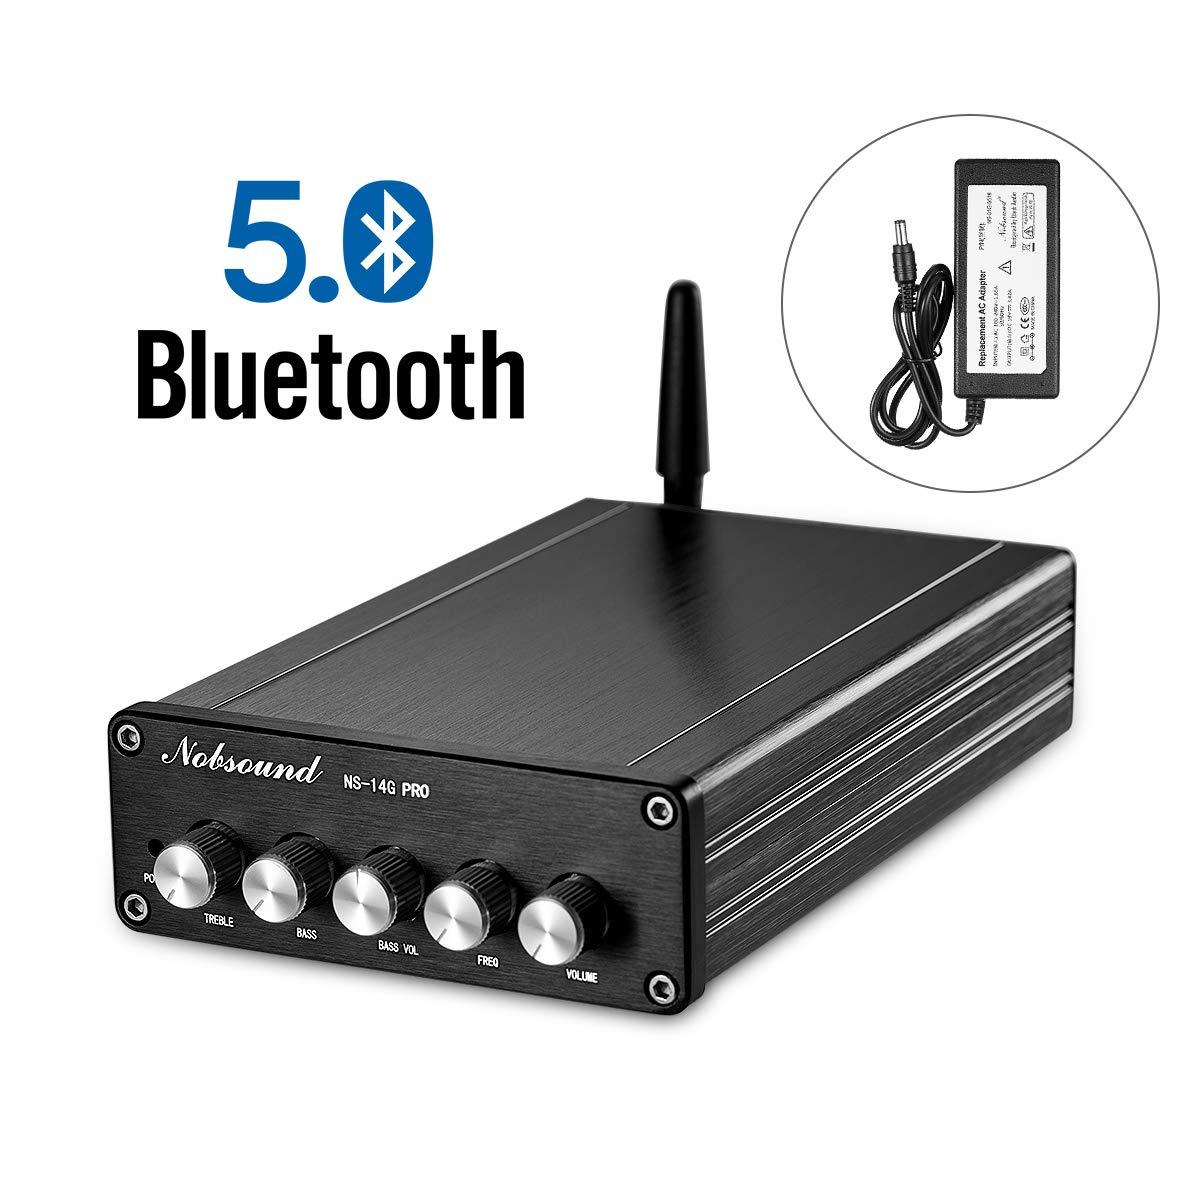 Nobsound 2.1 Channel Bluetooth 5.0 Amplifier, Class D Stereo Audio Amplifier, Mini Home Theater Power Amp, Digital Power Subwoofer Amplifier Receiver, 100W+50Wx2, Treble&Bass Control (NS-14G PRO)